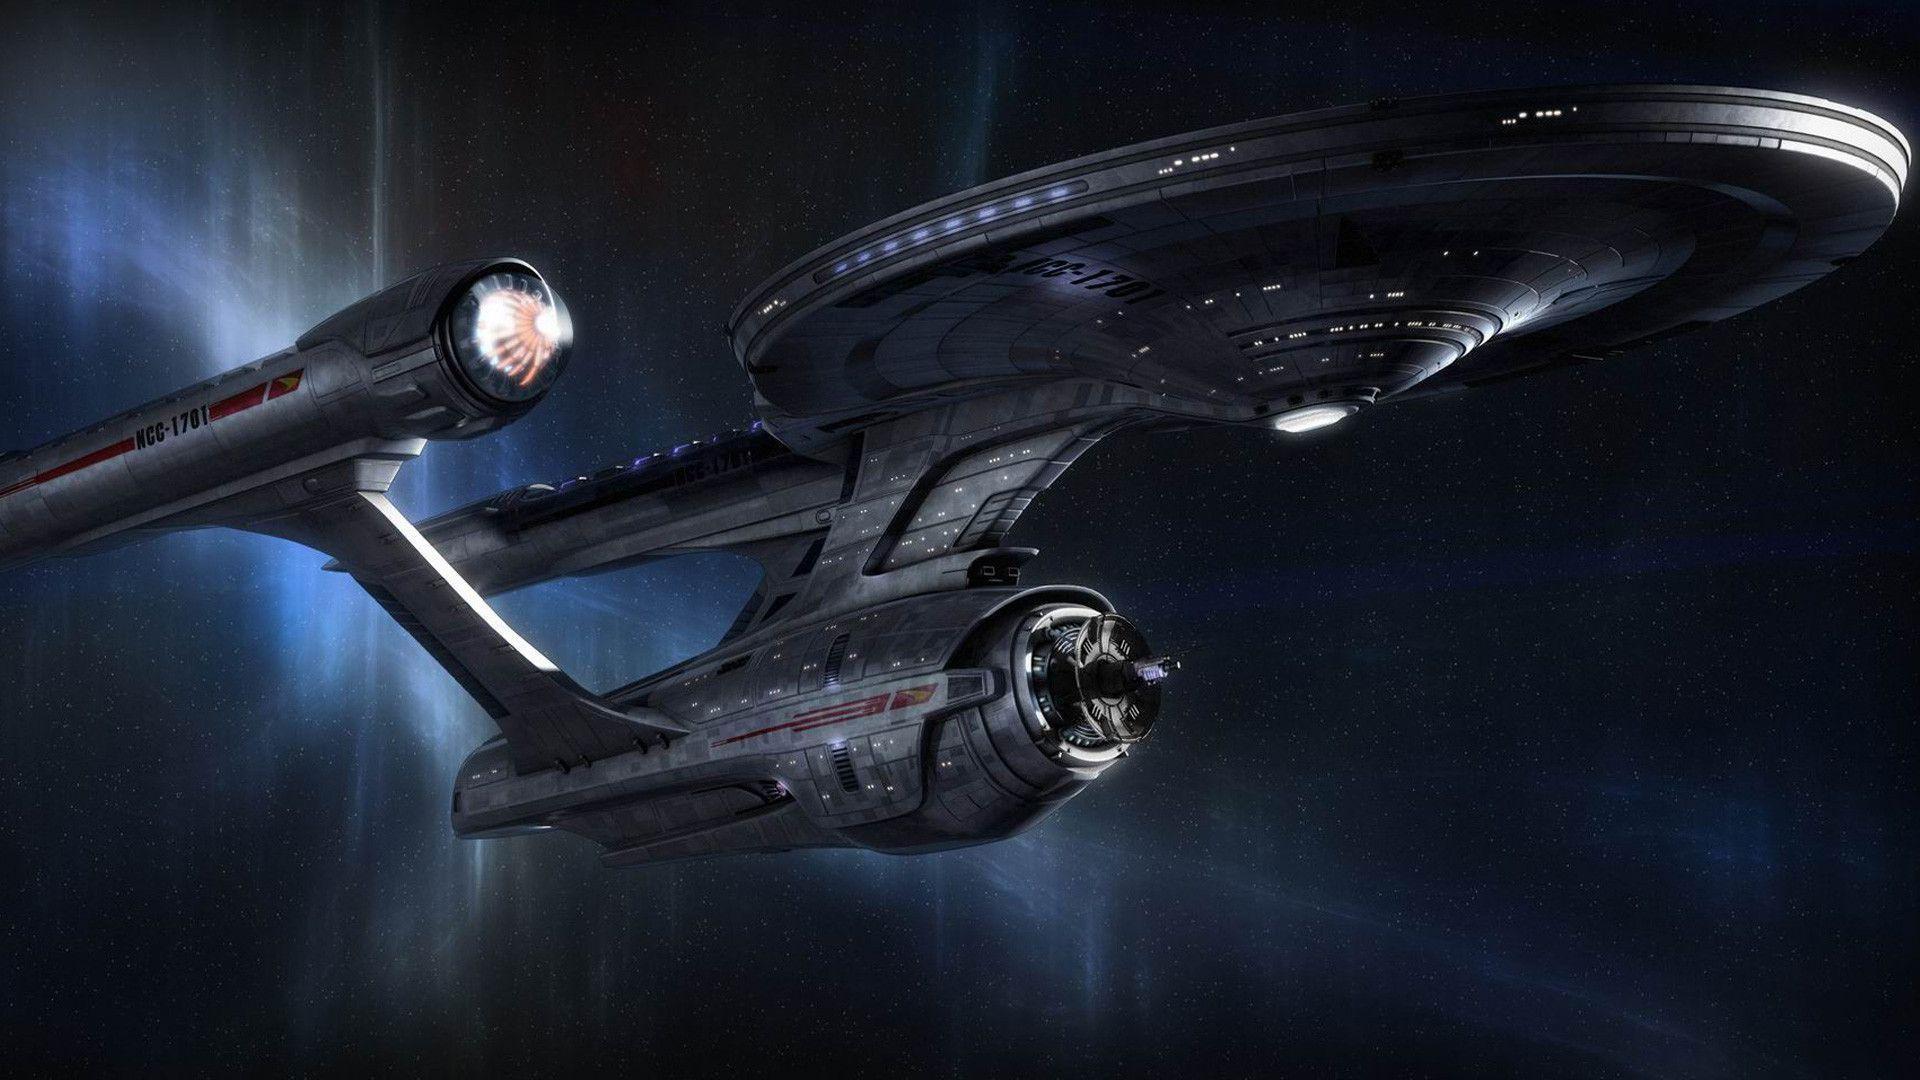 Star Trek Wallpapers HD 1920x1080